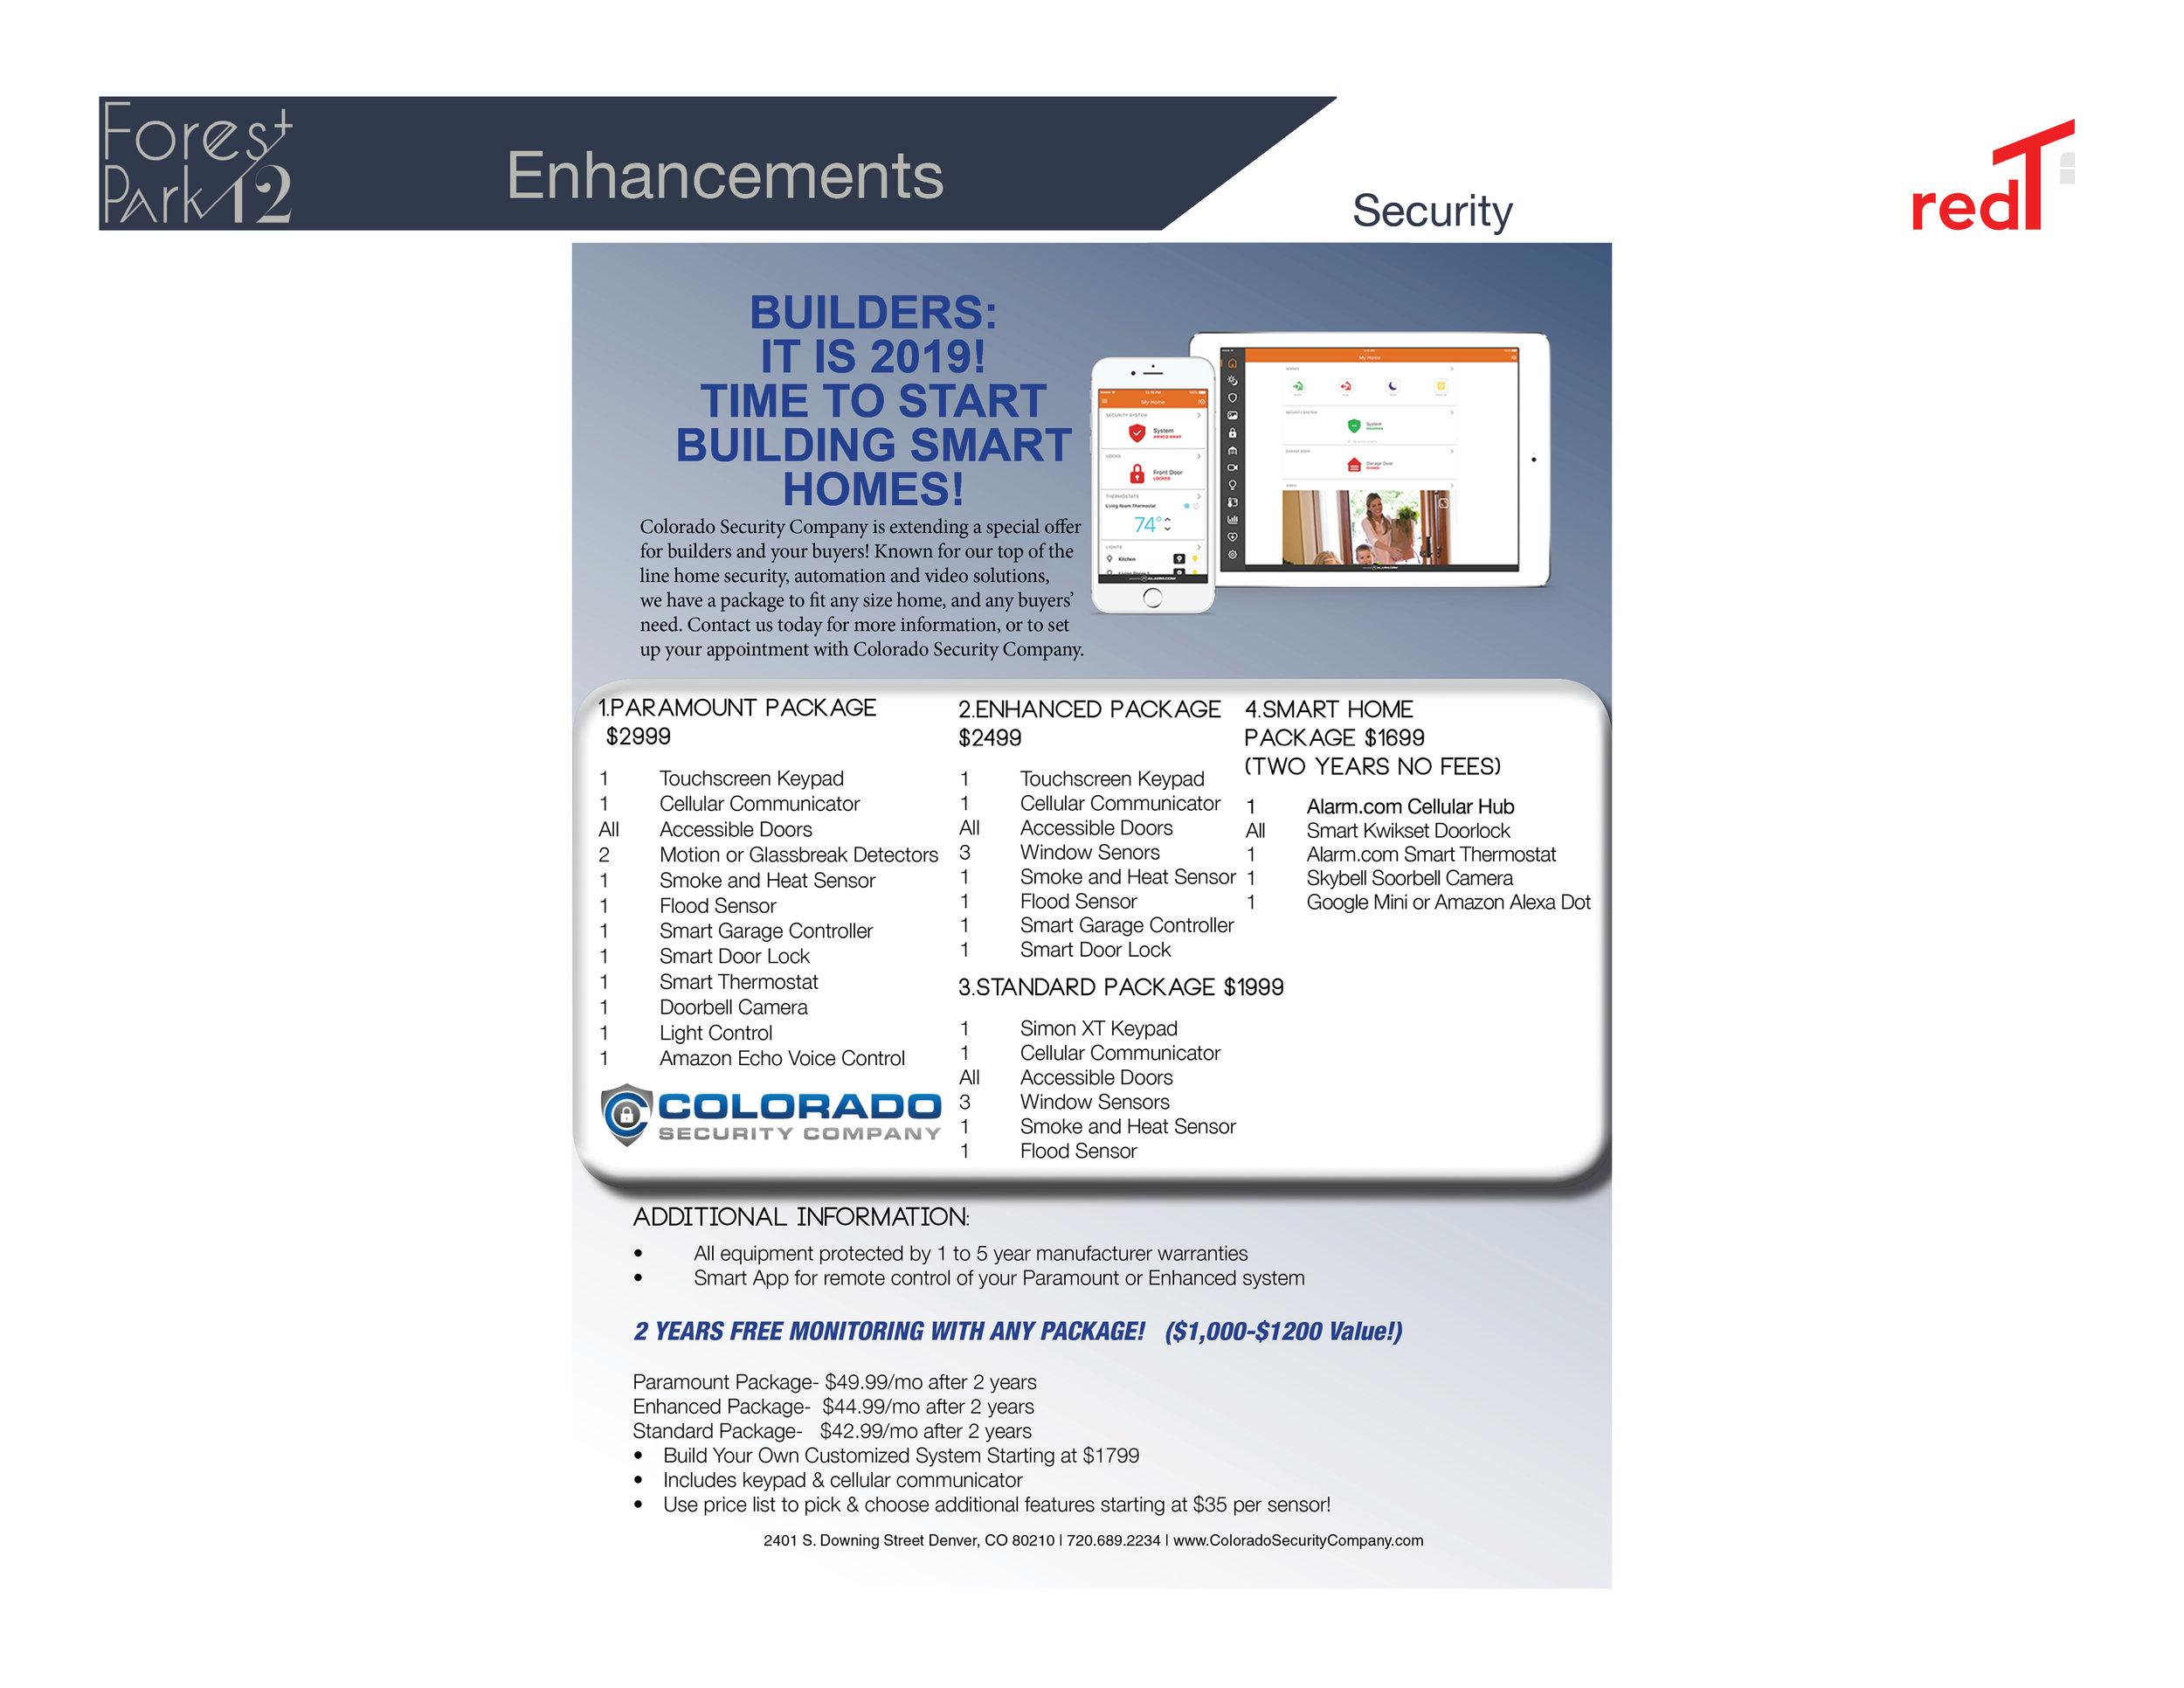 Enhancements jpg3.jpg